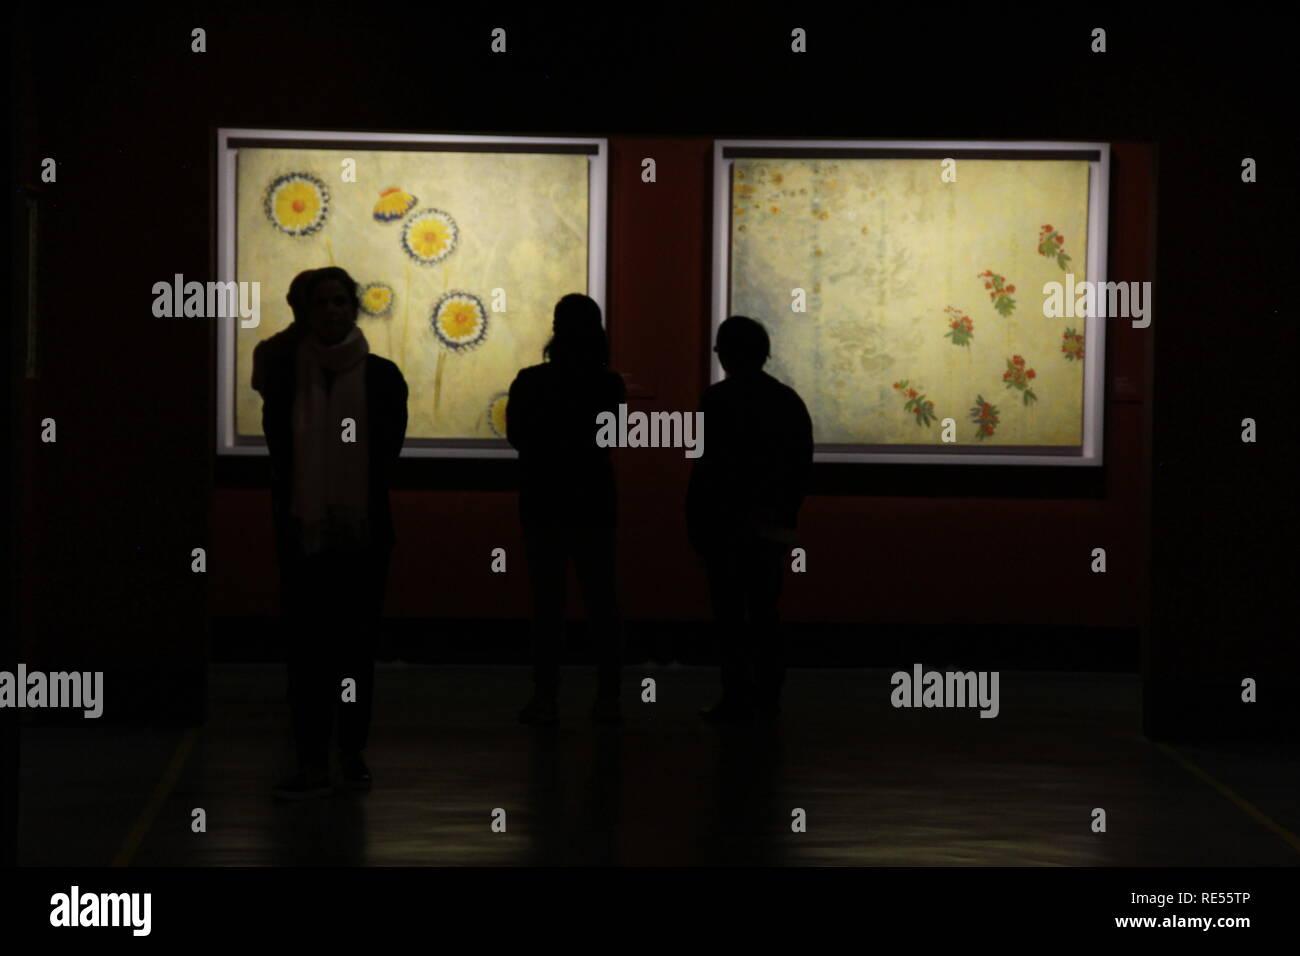 Marguerites, 1901, Odilon Redon (1840-1916), óleo, temple, e carvão pastel sobre tela, Museo d'Orsay, París, 2016, CCBB, São Paulo, Brasil Imagen De Stock